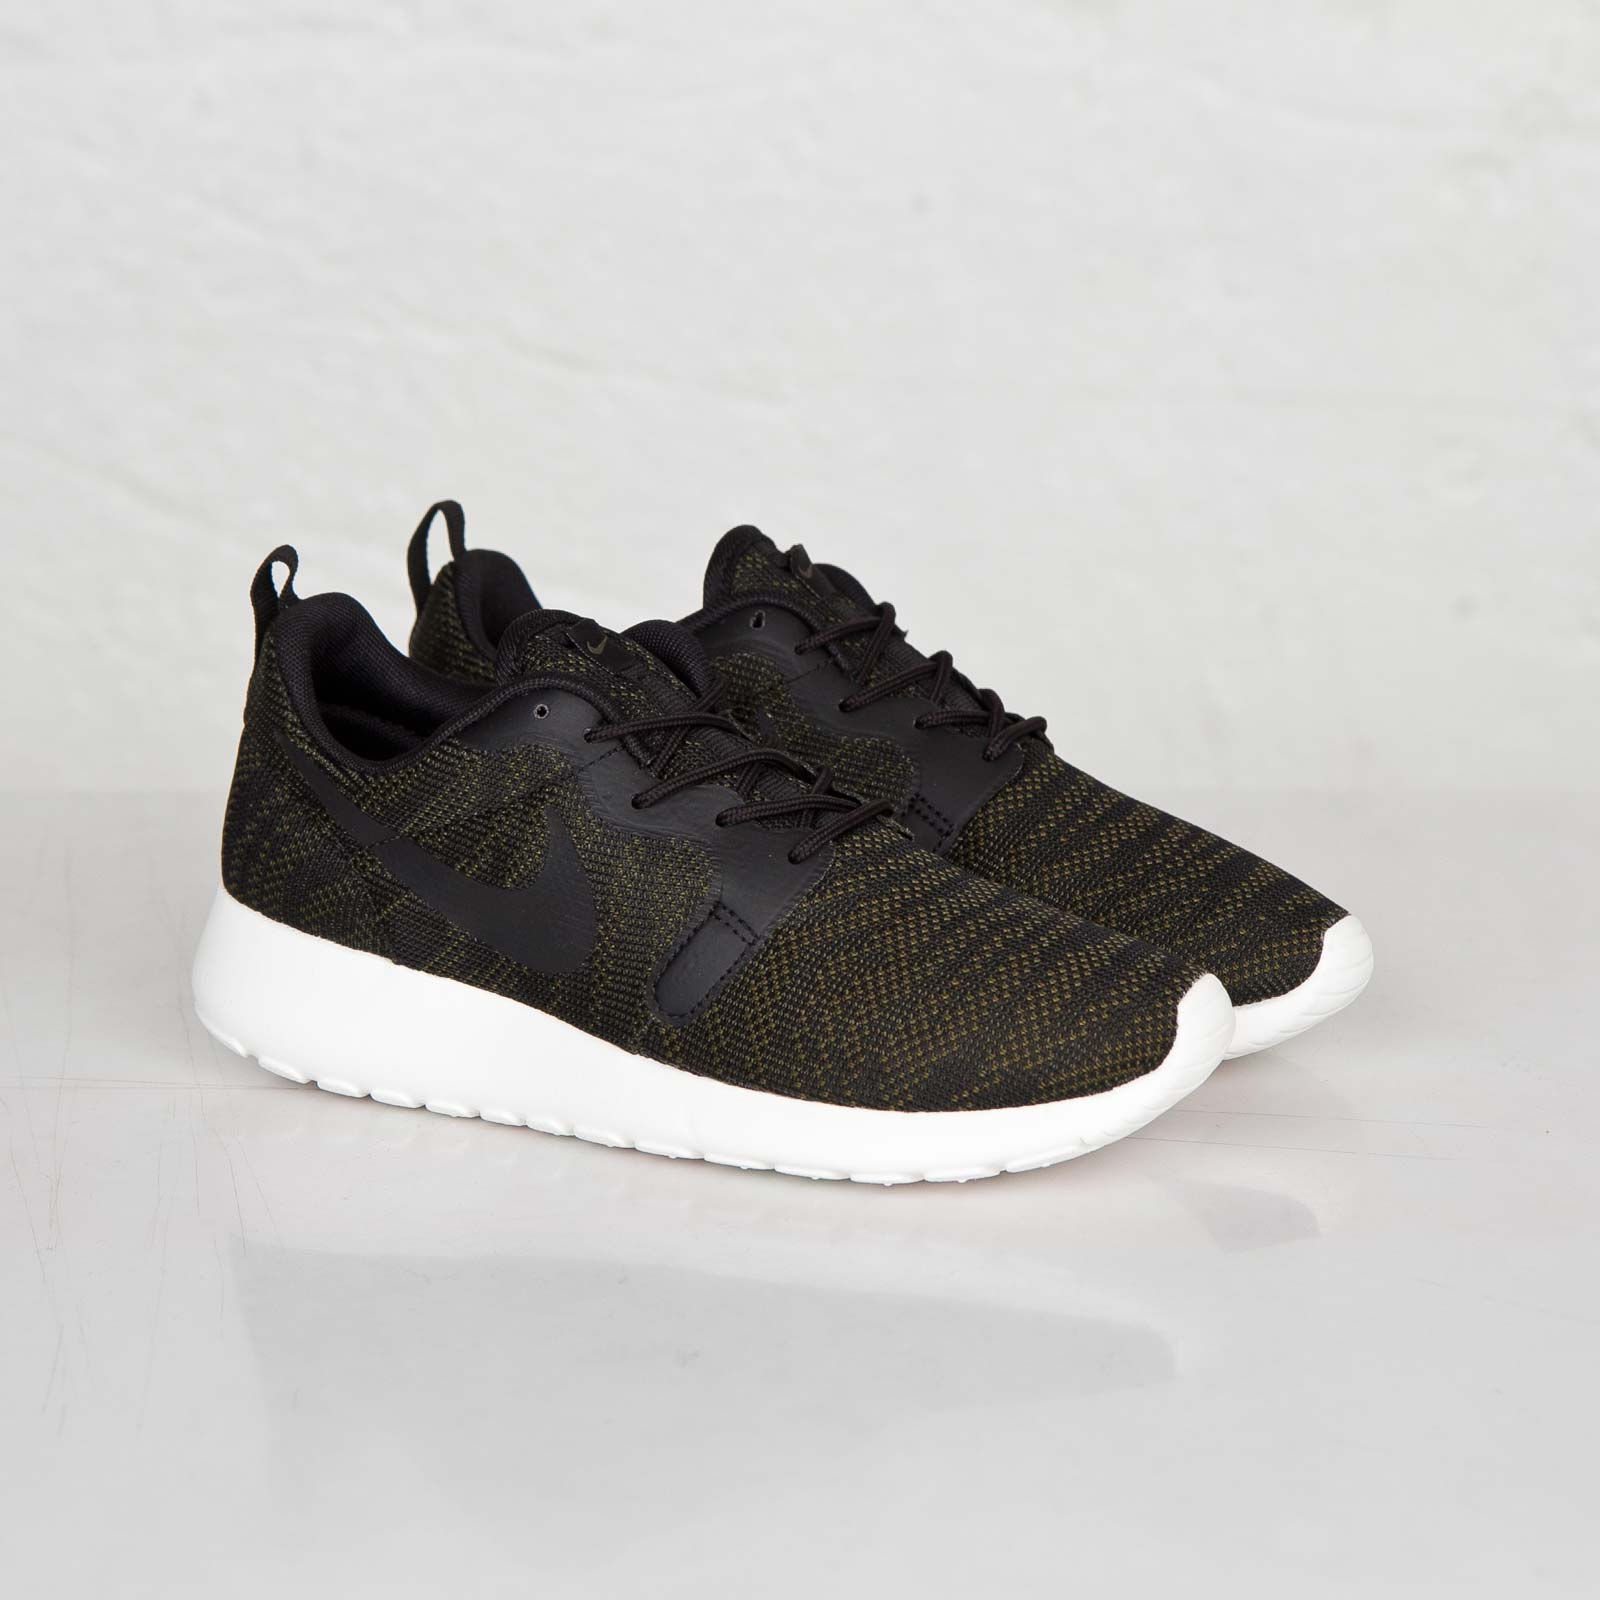 Nike Wmns Roshe Run Jacquard (Olive) | Sneakers